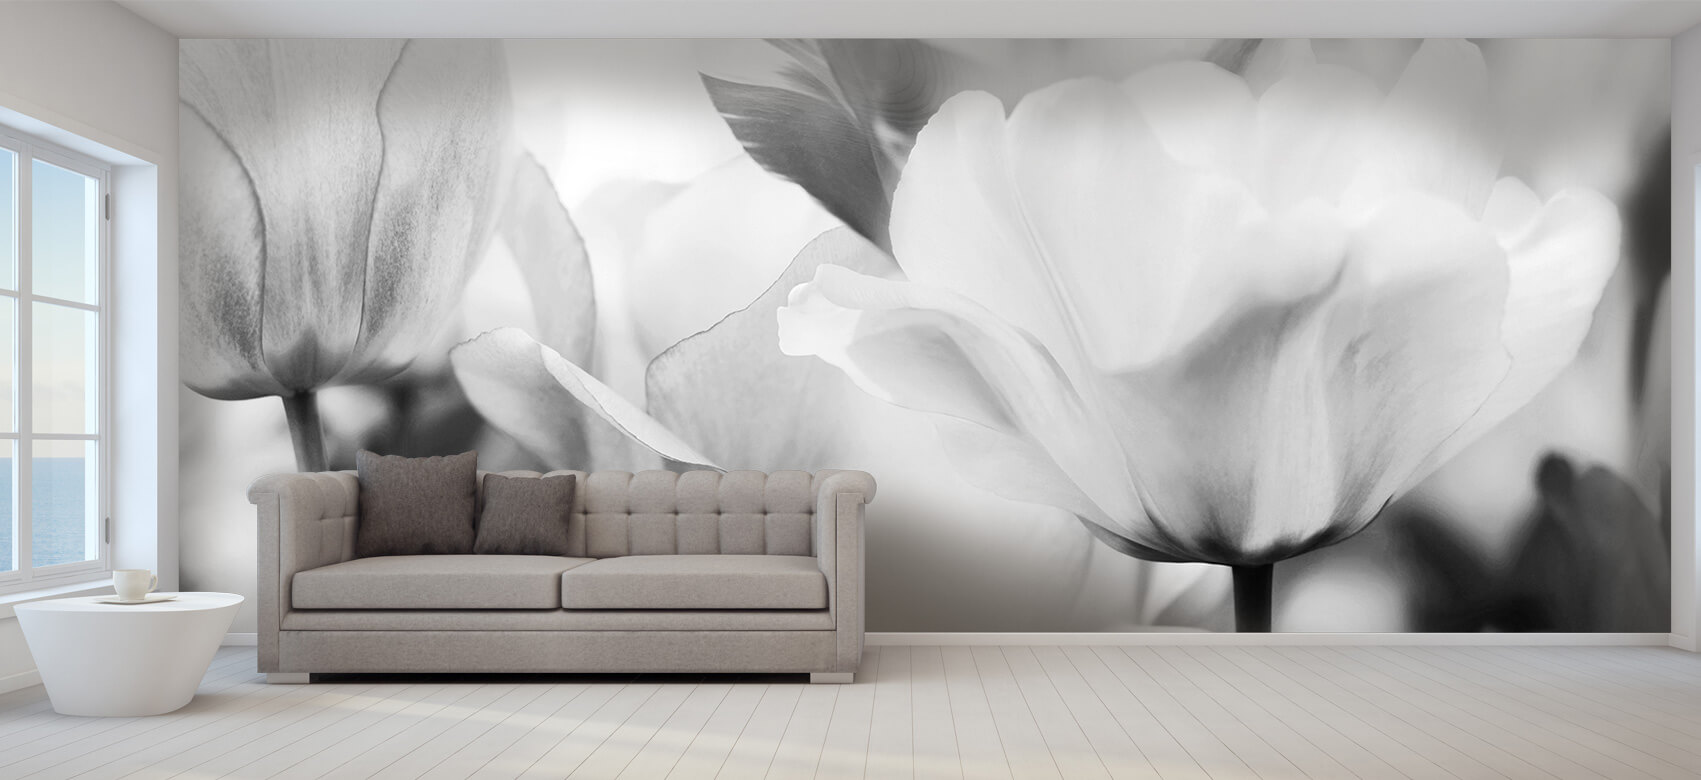 Bloemen, planten en bomen Tulpen fantasie 9